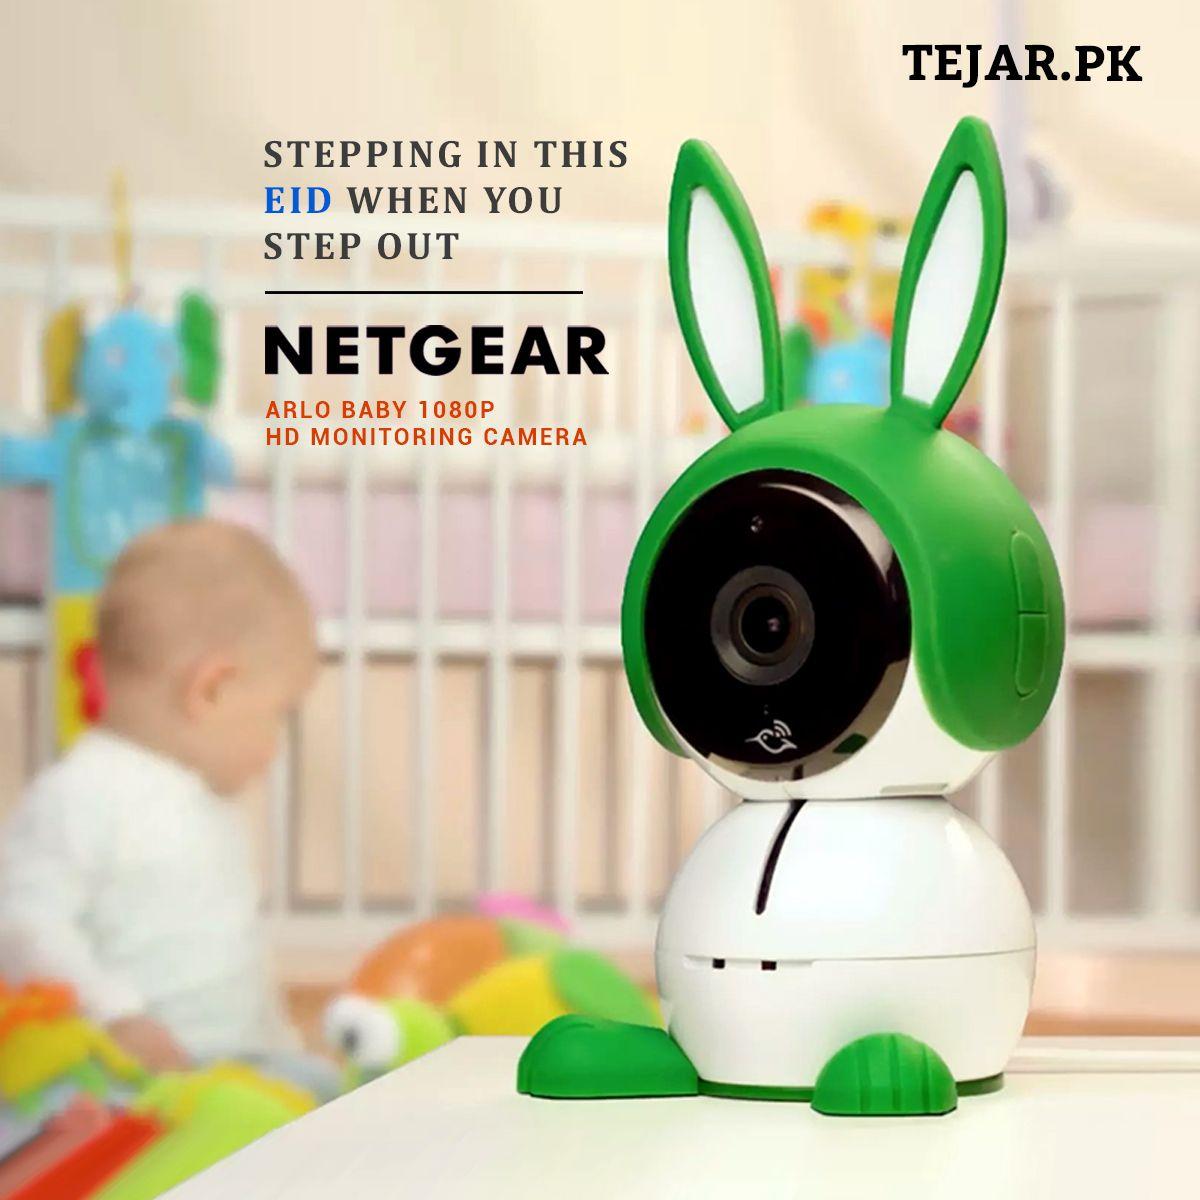 Arlo baby 1080p hd monitoring camera camera netgear baby